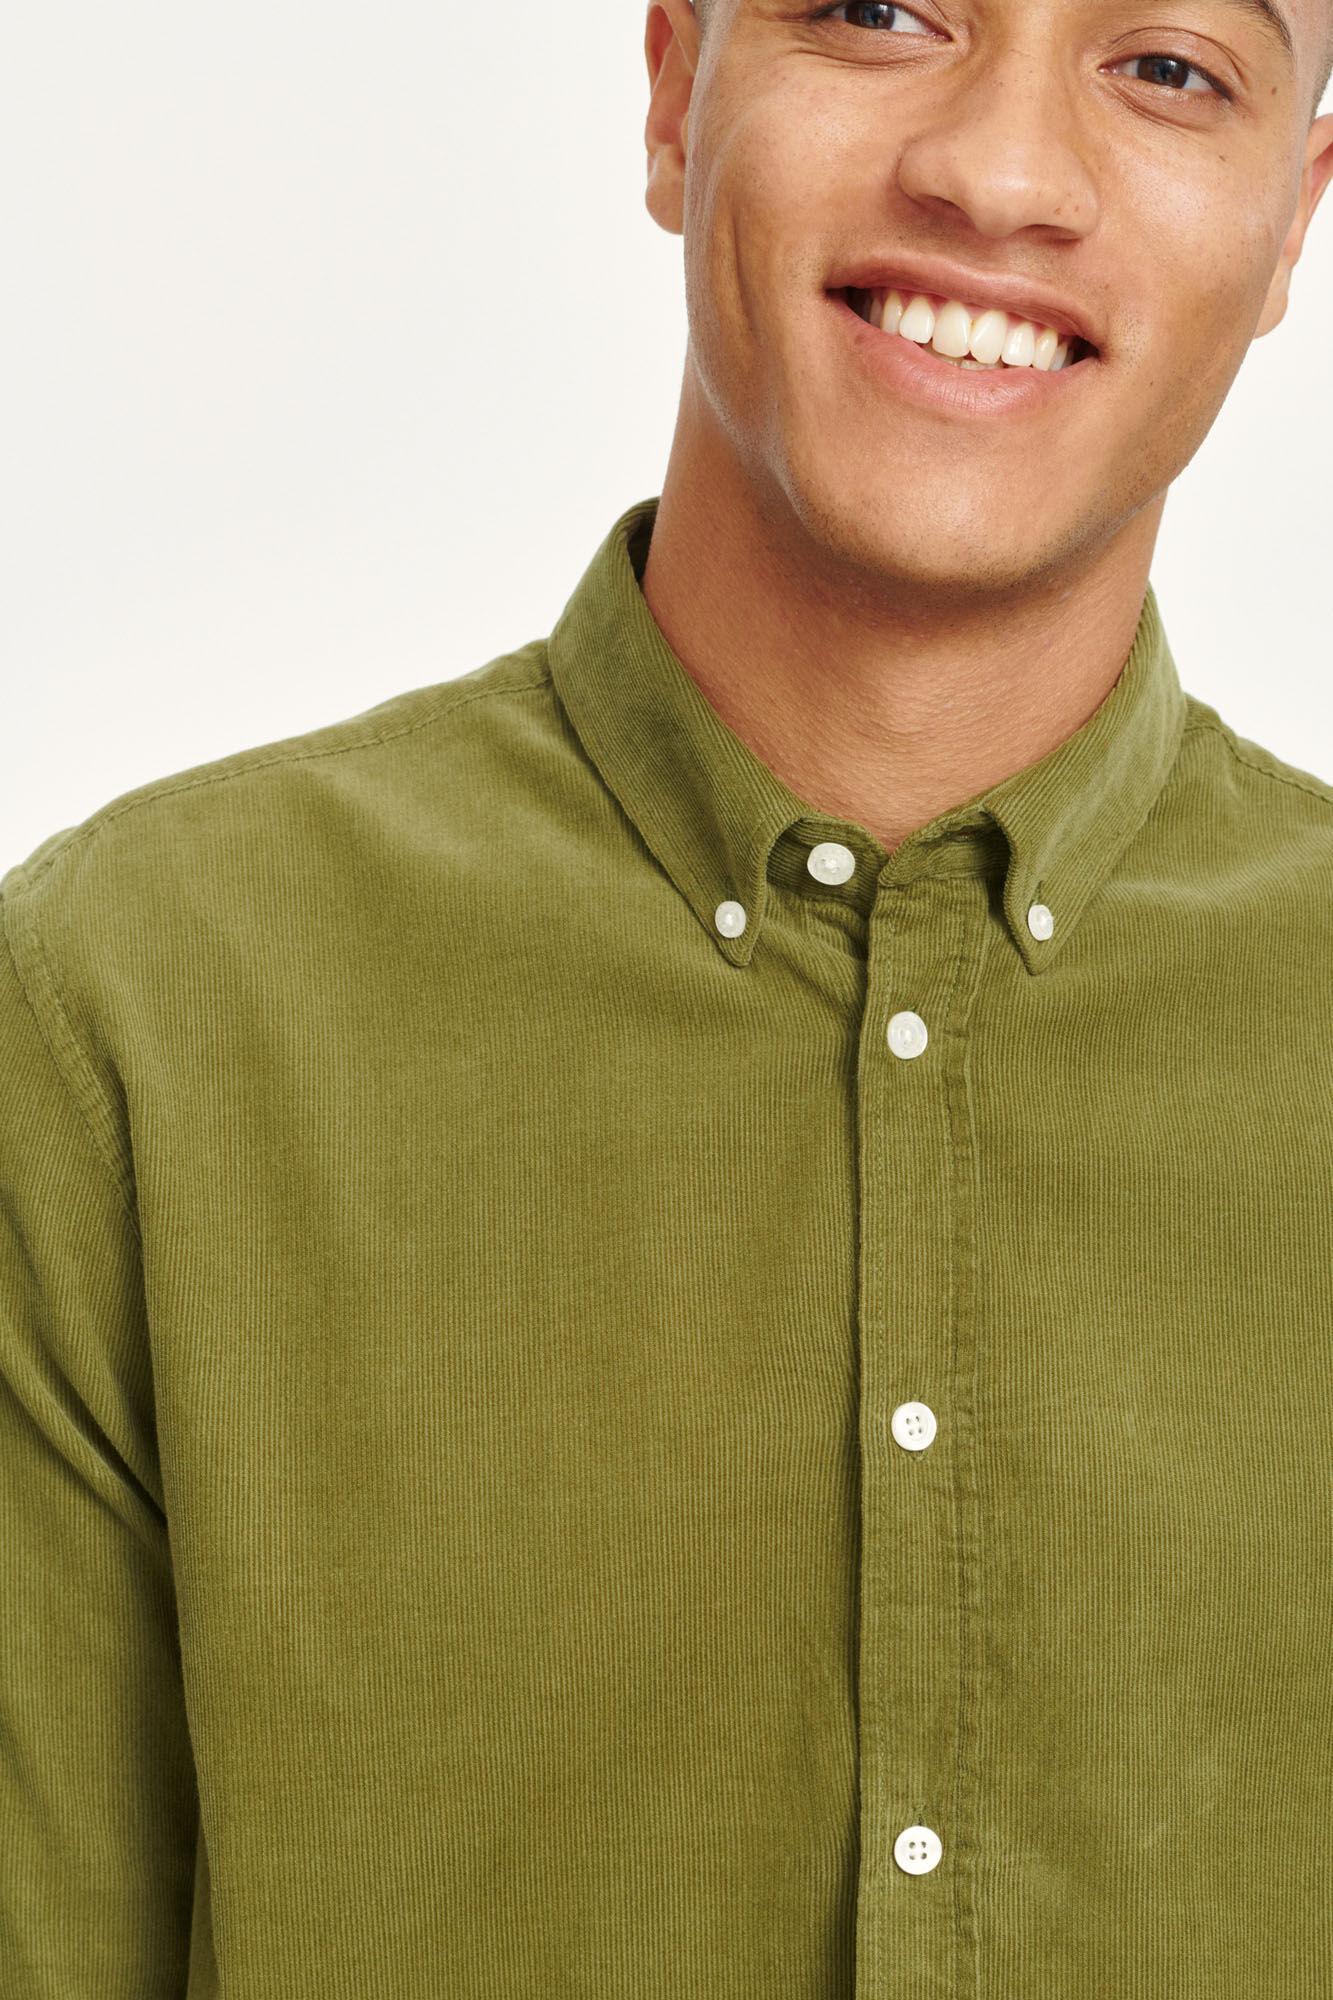 Liam BX Shirt Capulet Olive Green Corduroy-2